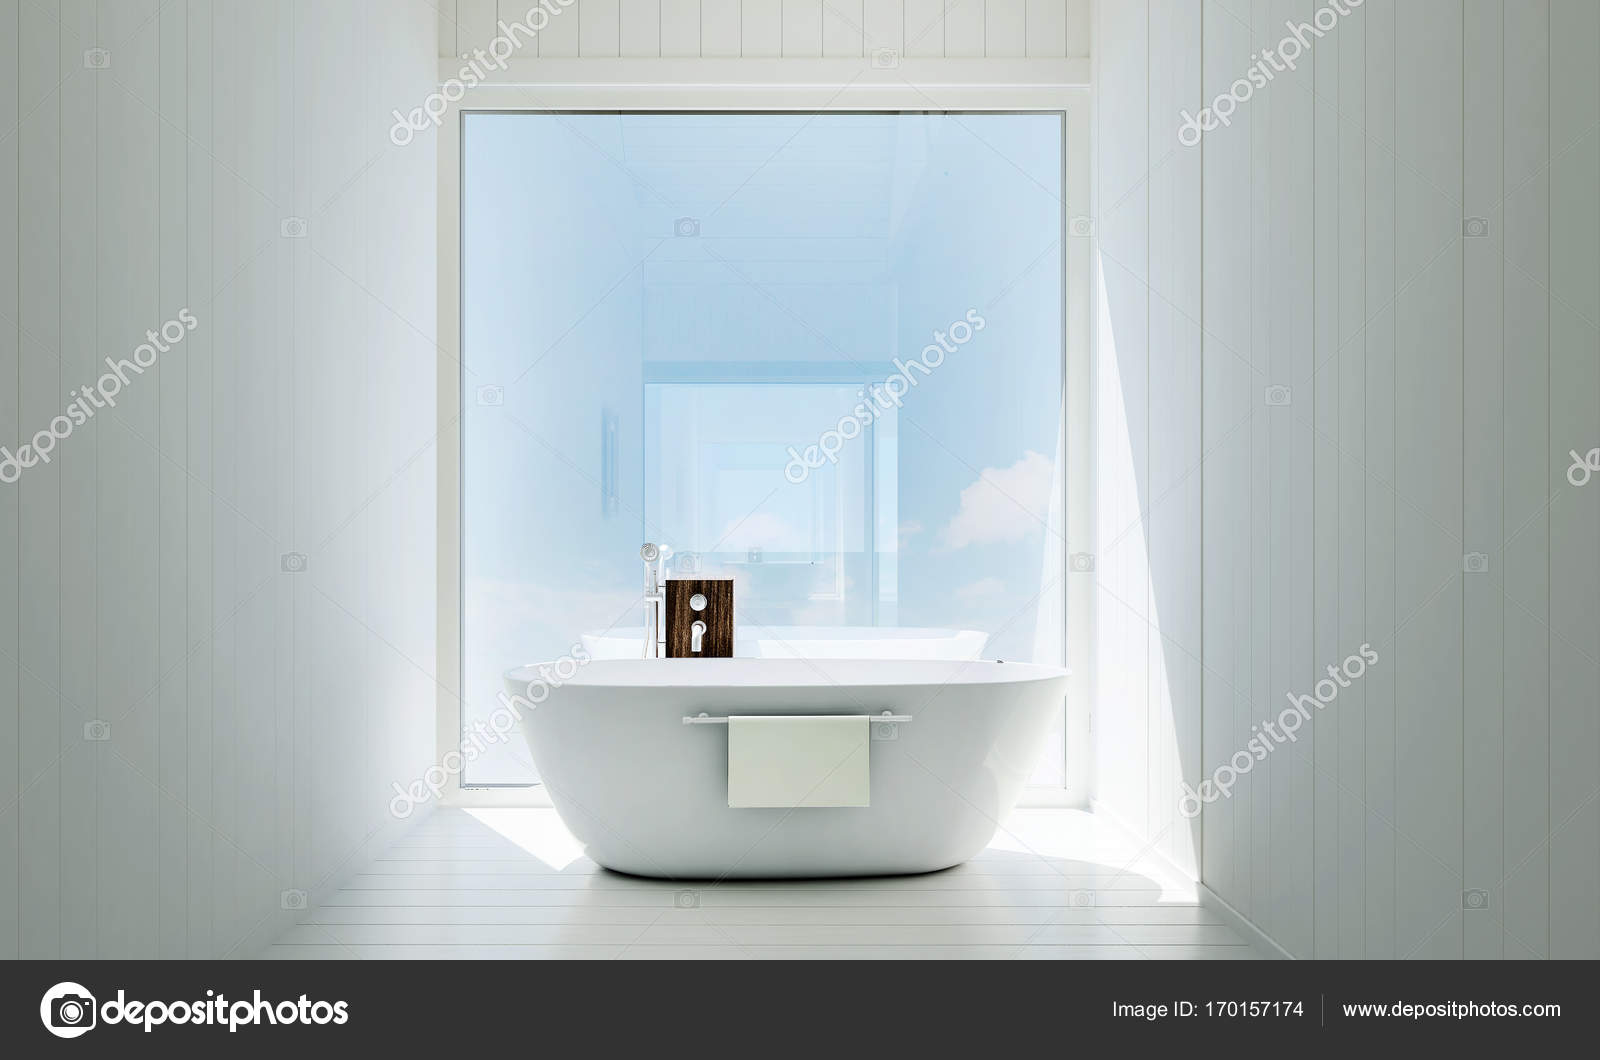 Badkamer Beton Interieur : De minimale witte badkamer interieur en beton muur textuur